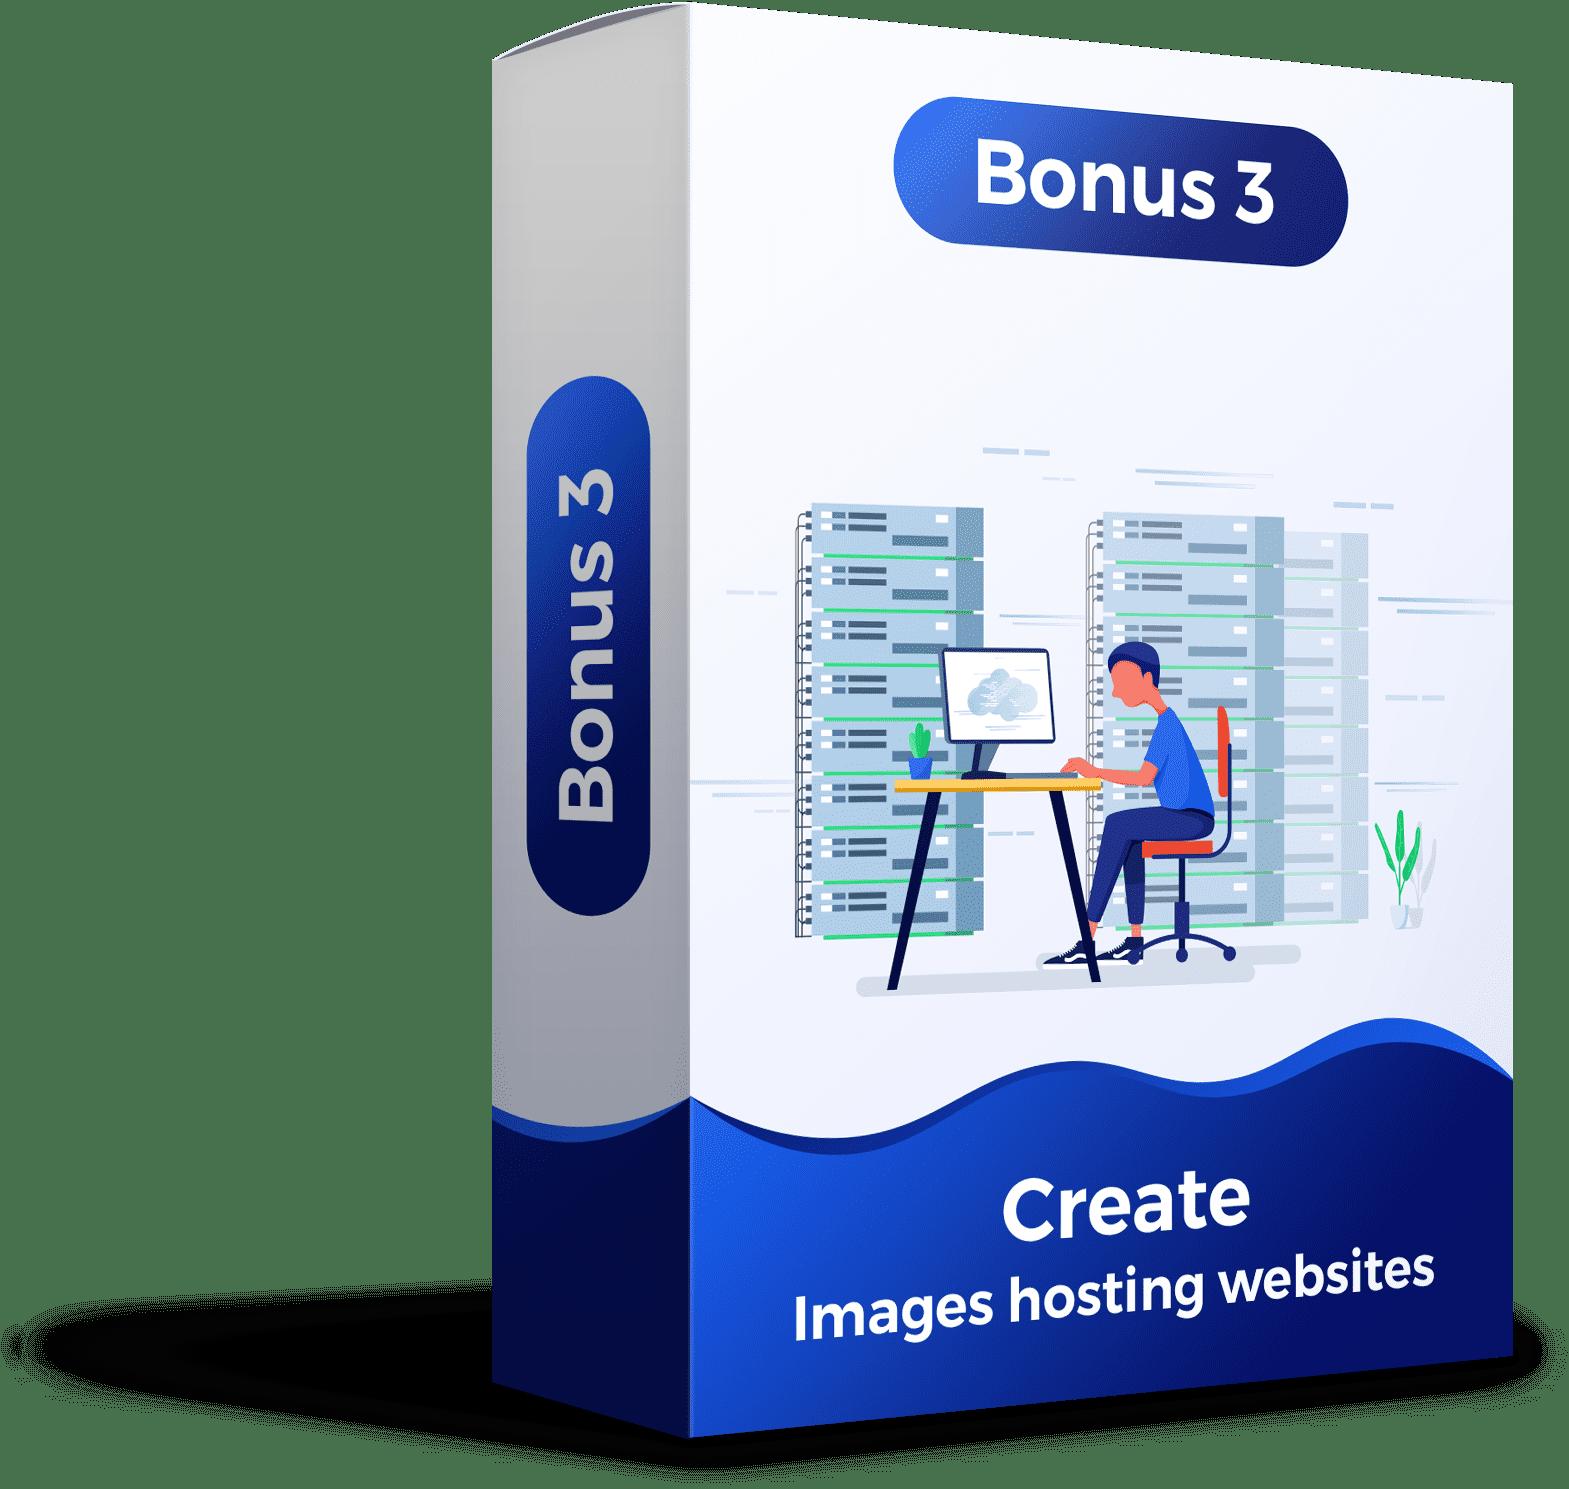 Create Image Hosting Websites